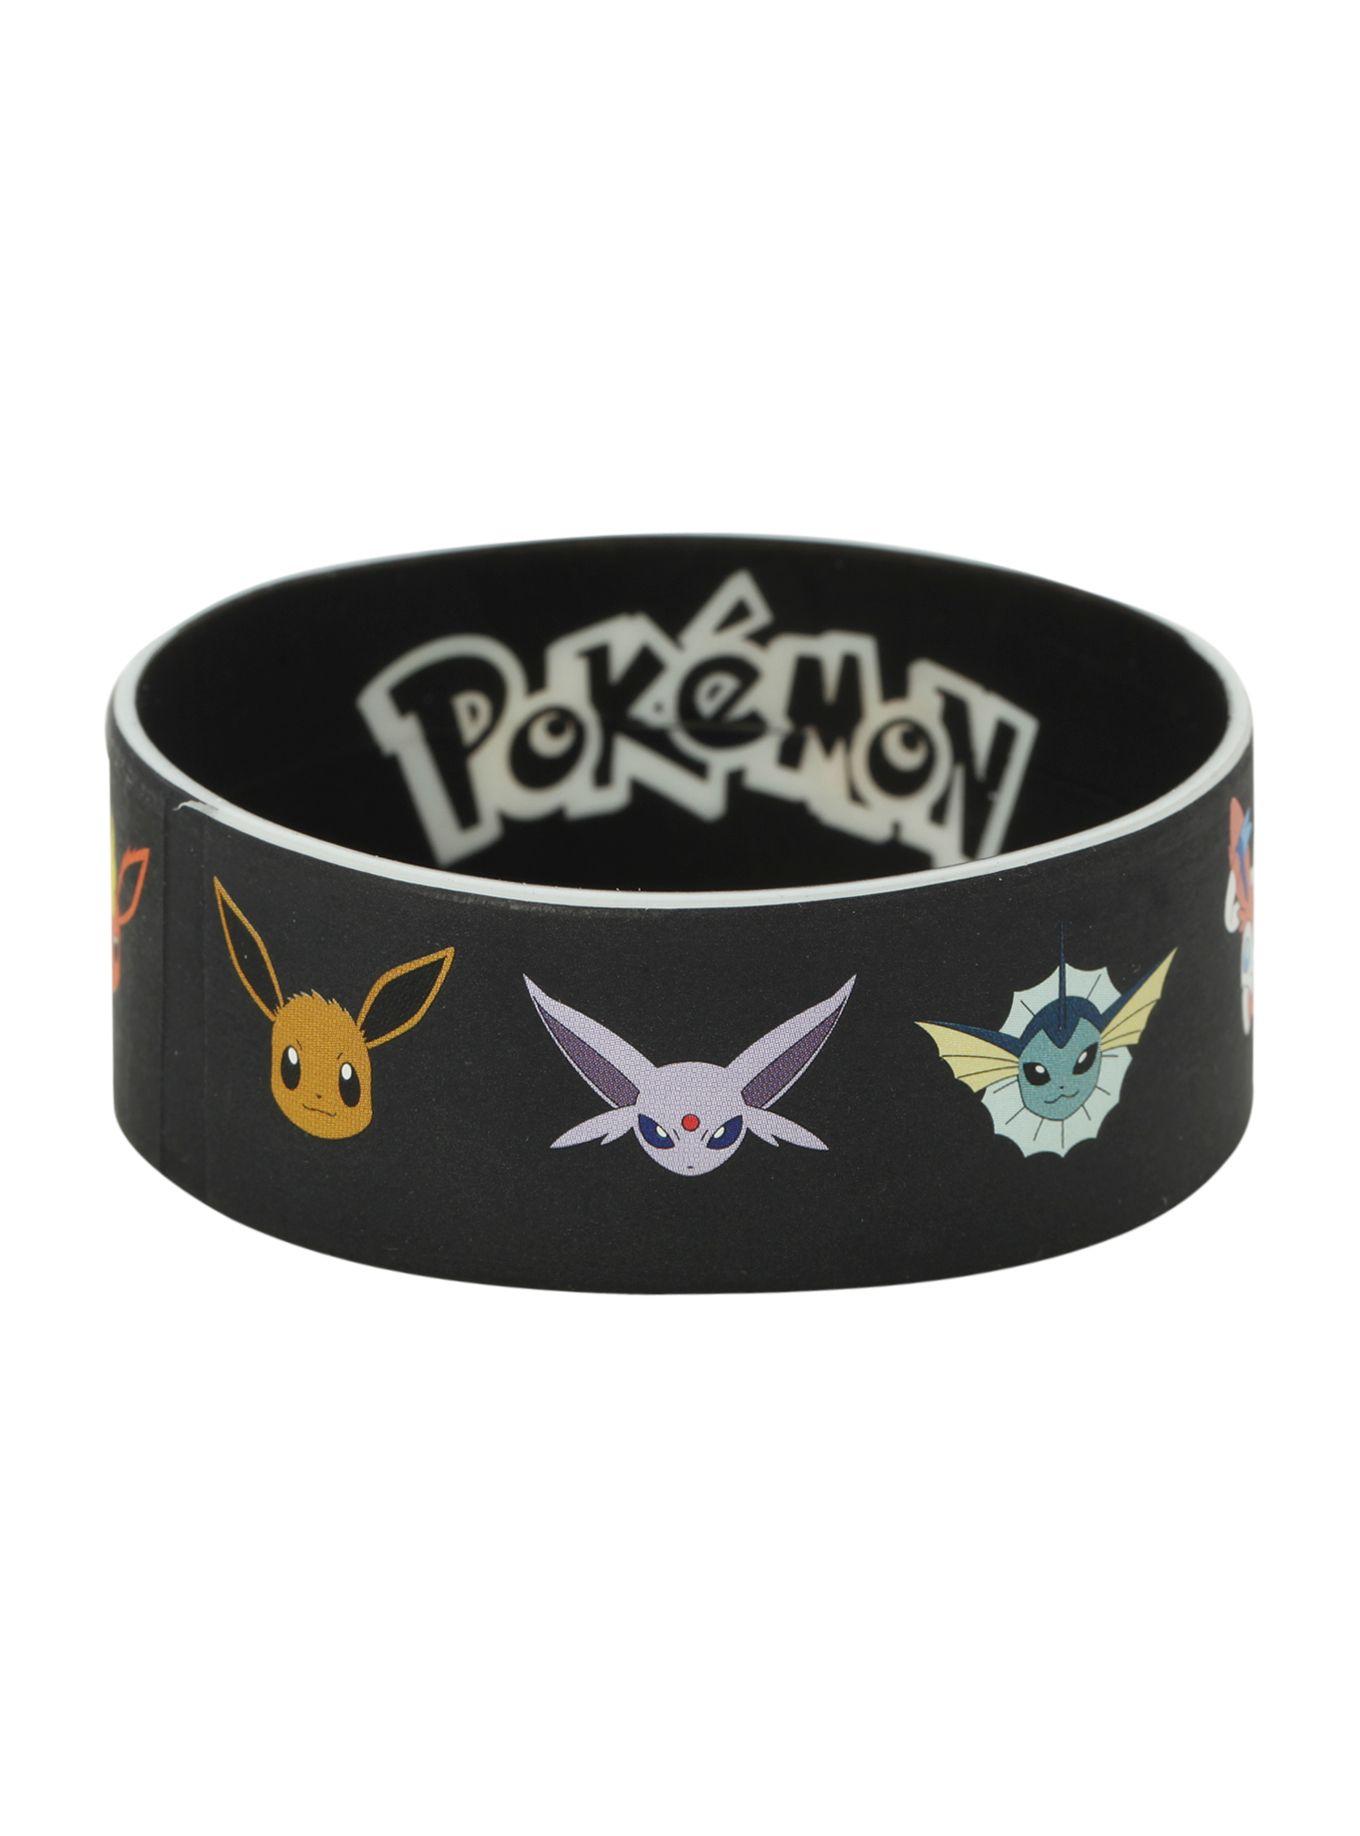 Pokemon Eevee Evolution Rubber Bracelet Hot Topic